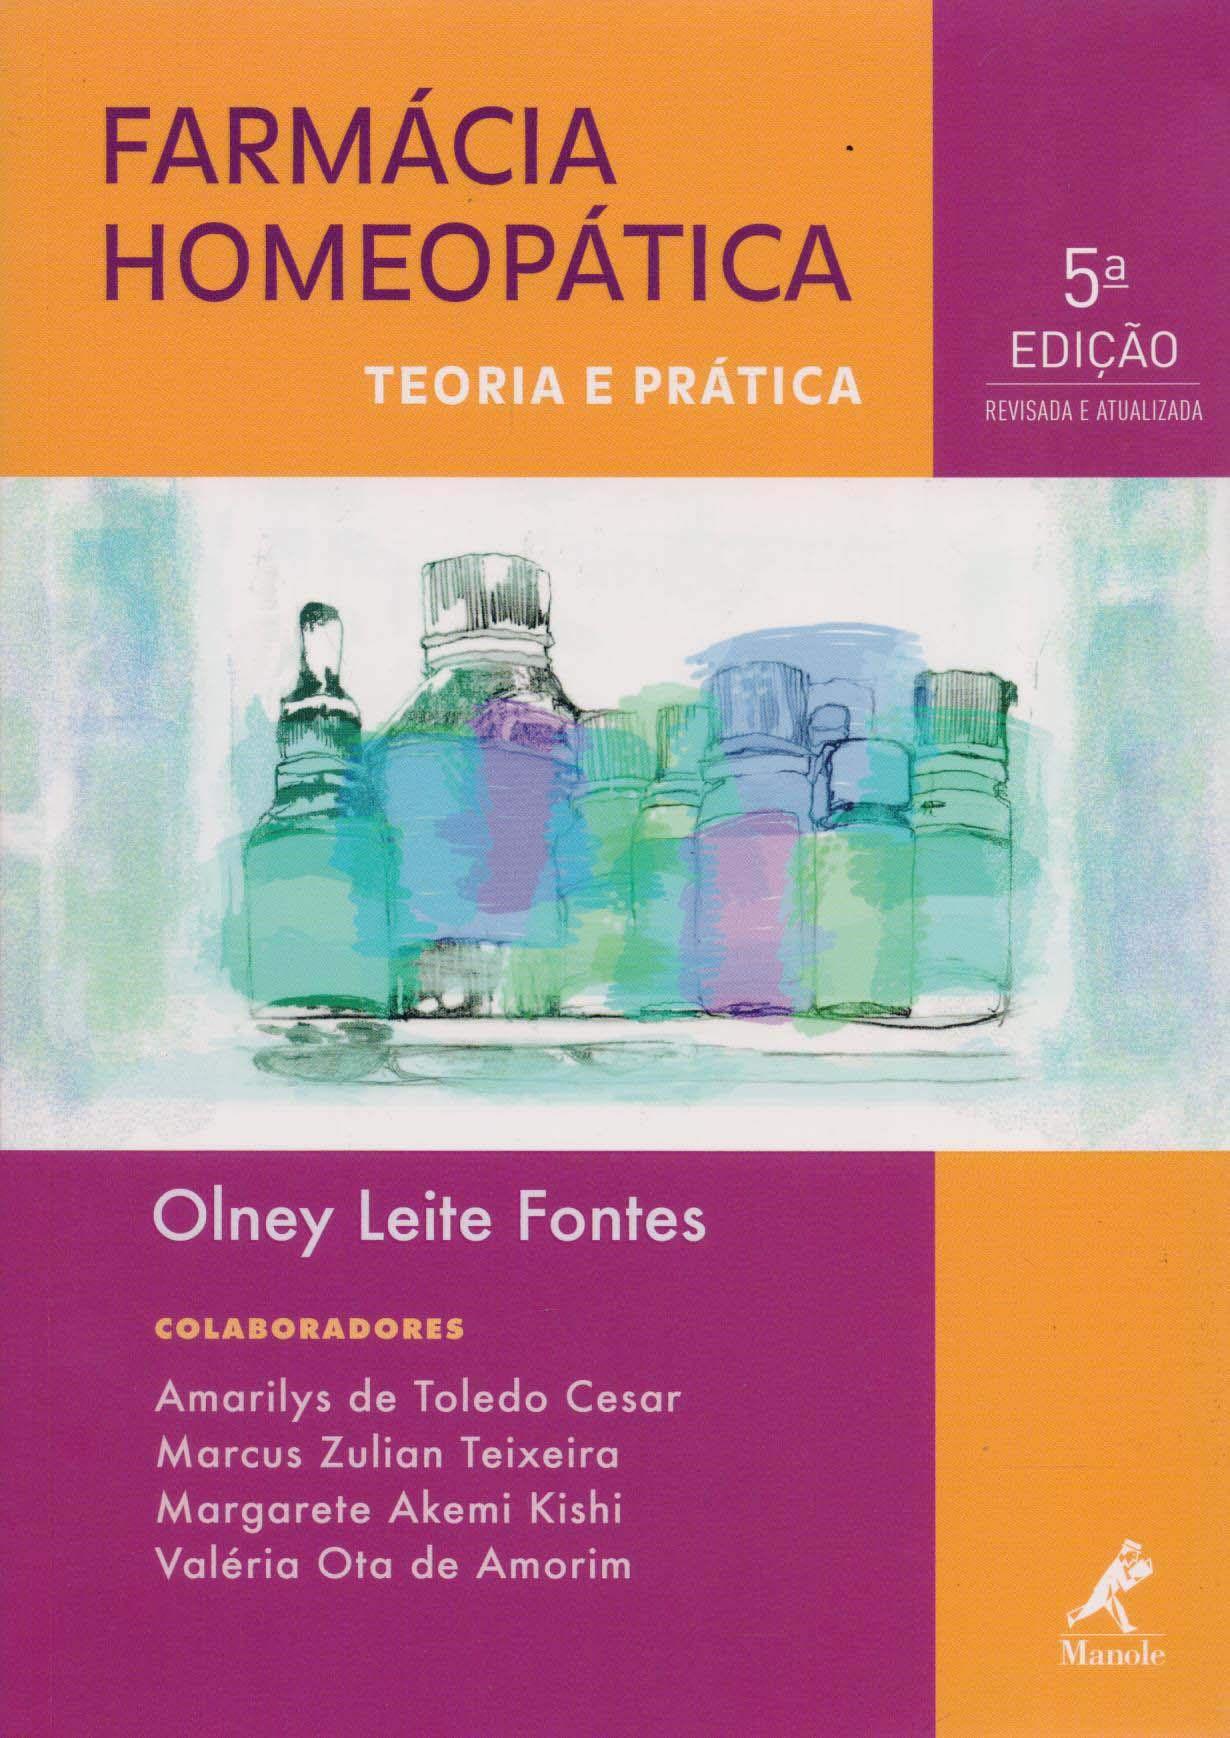 Livro Farmácia Homeopática